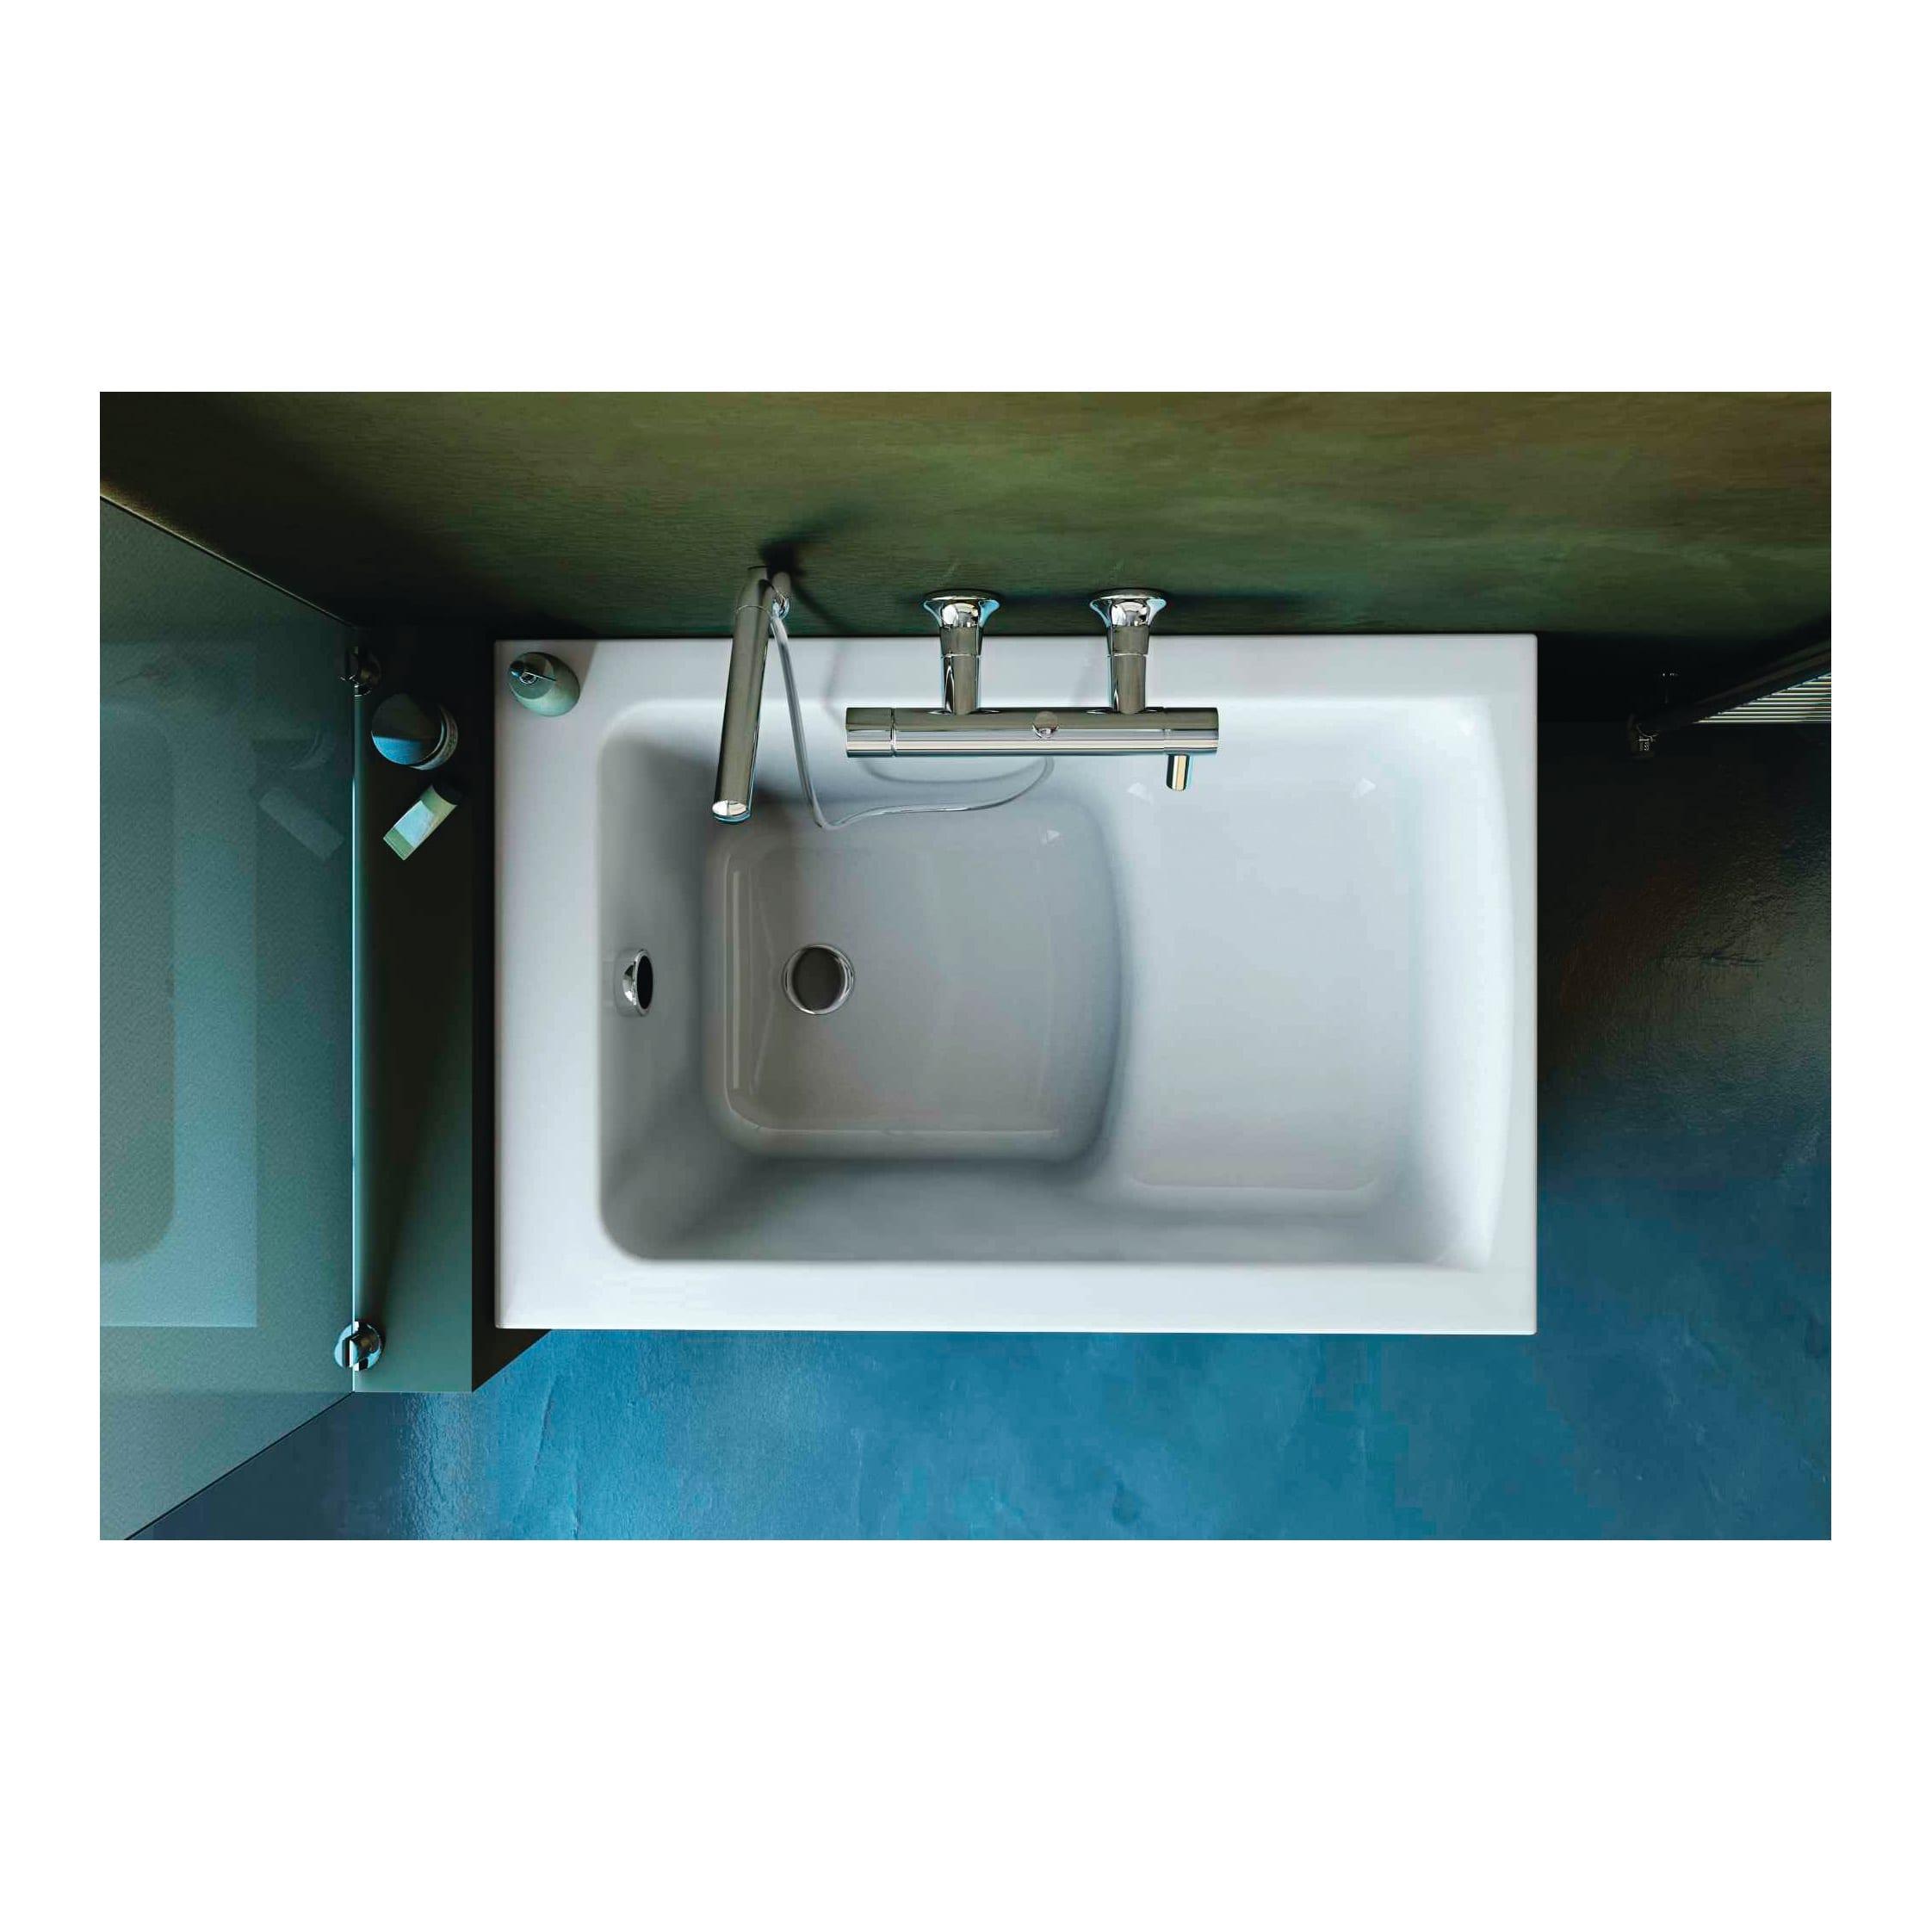 Vasca Da Bagno 120x70 Ideal Standard.Vasca Rettangolare Flower Bianco 120 X 70 Cm Ideal Standard